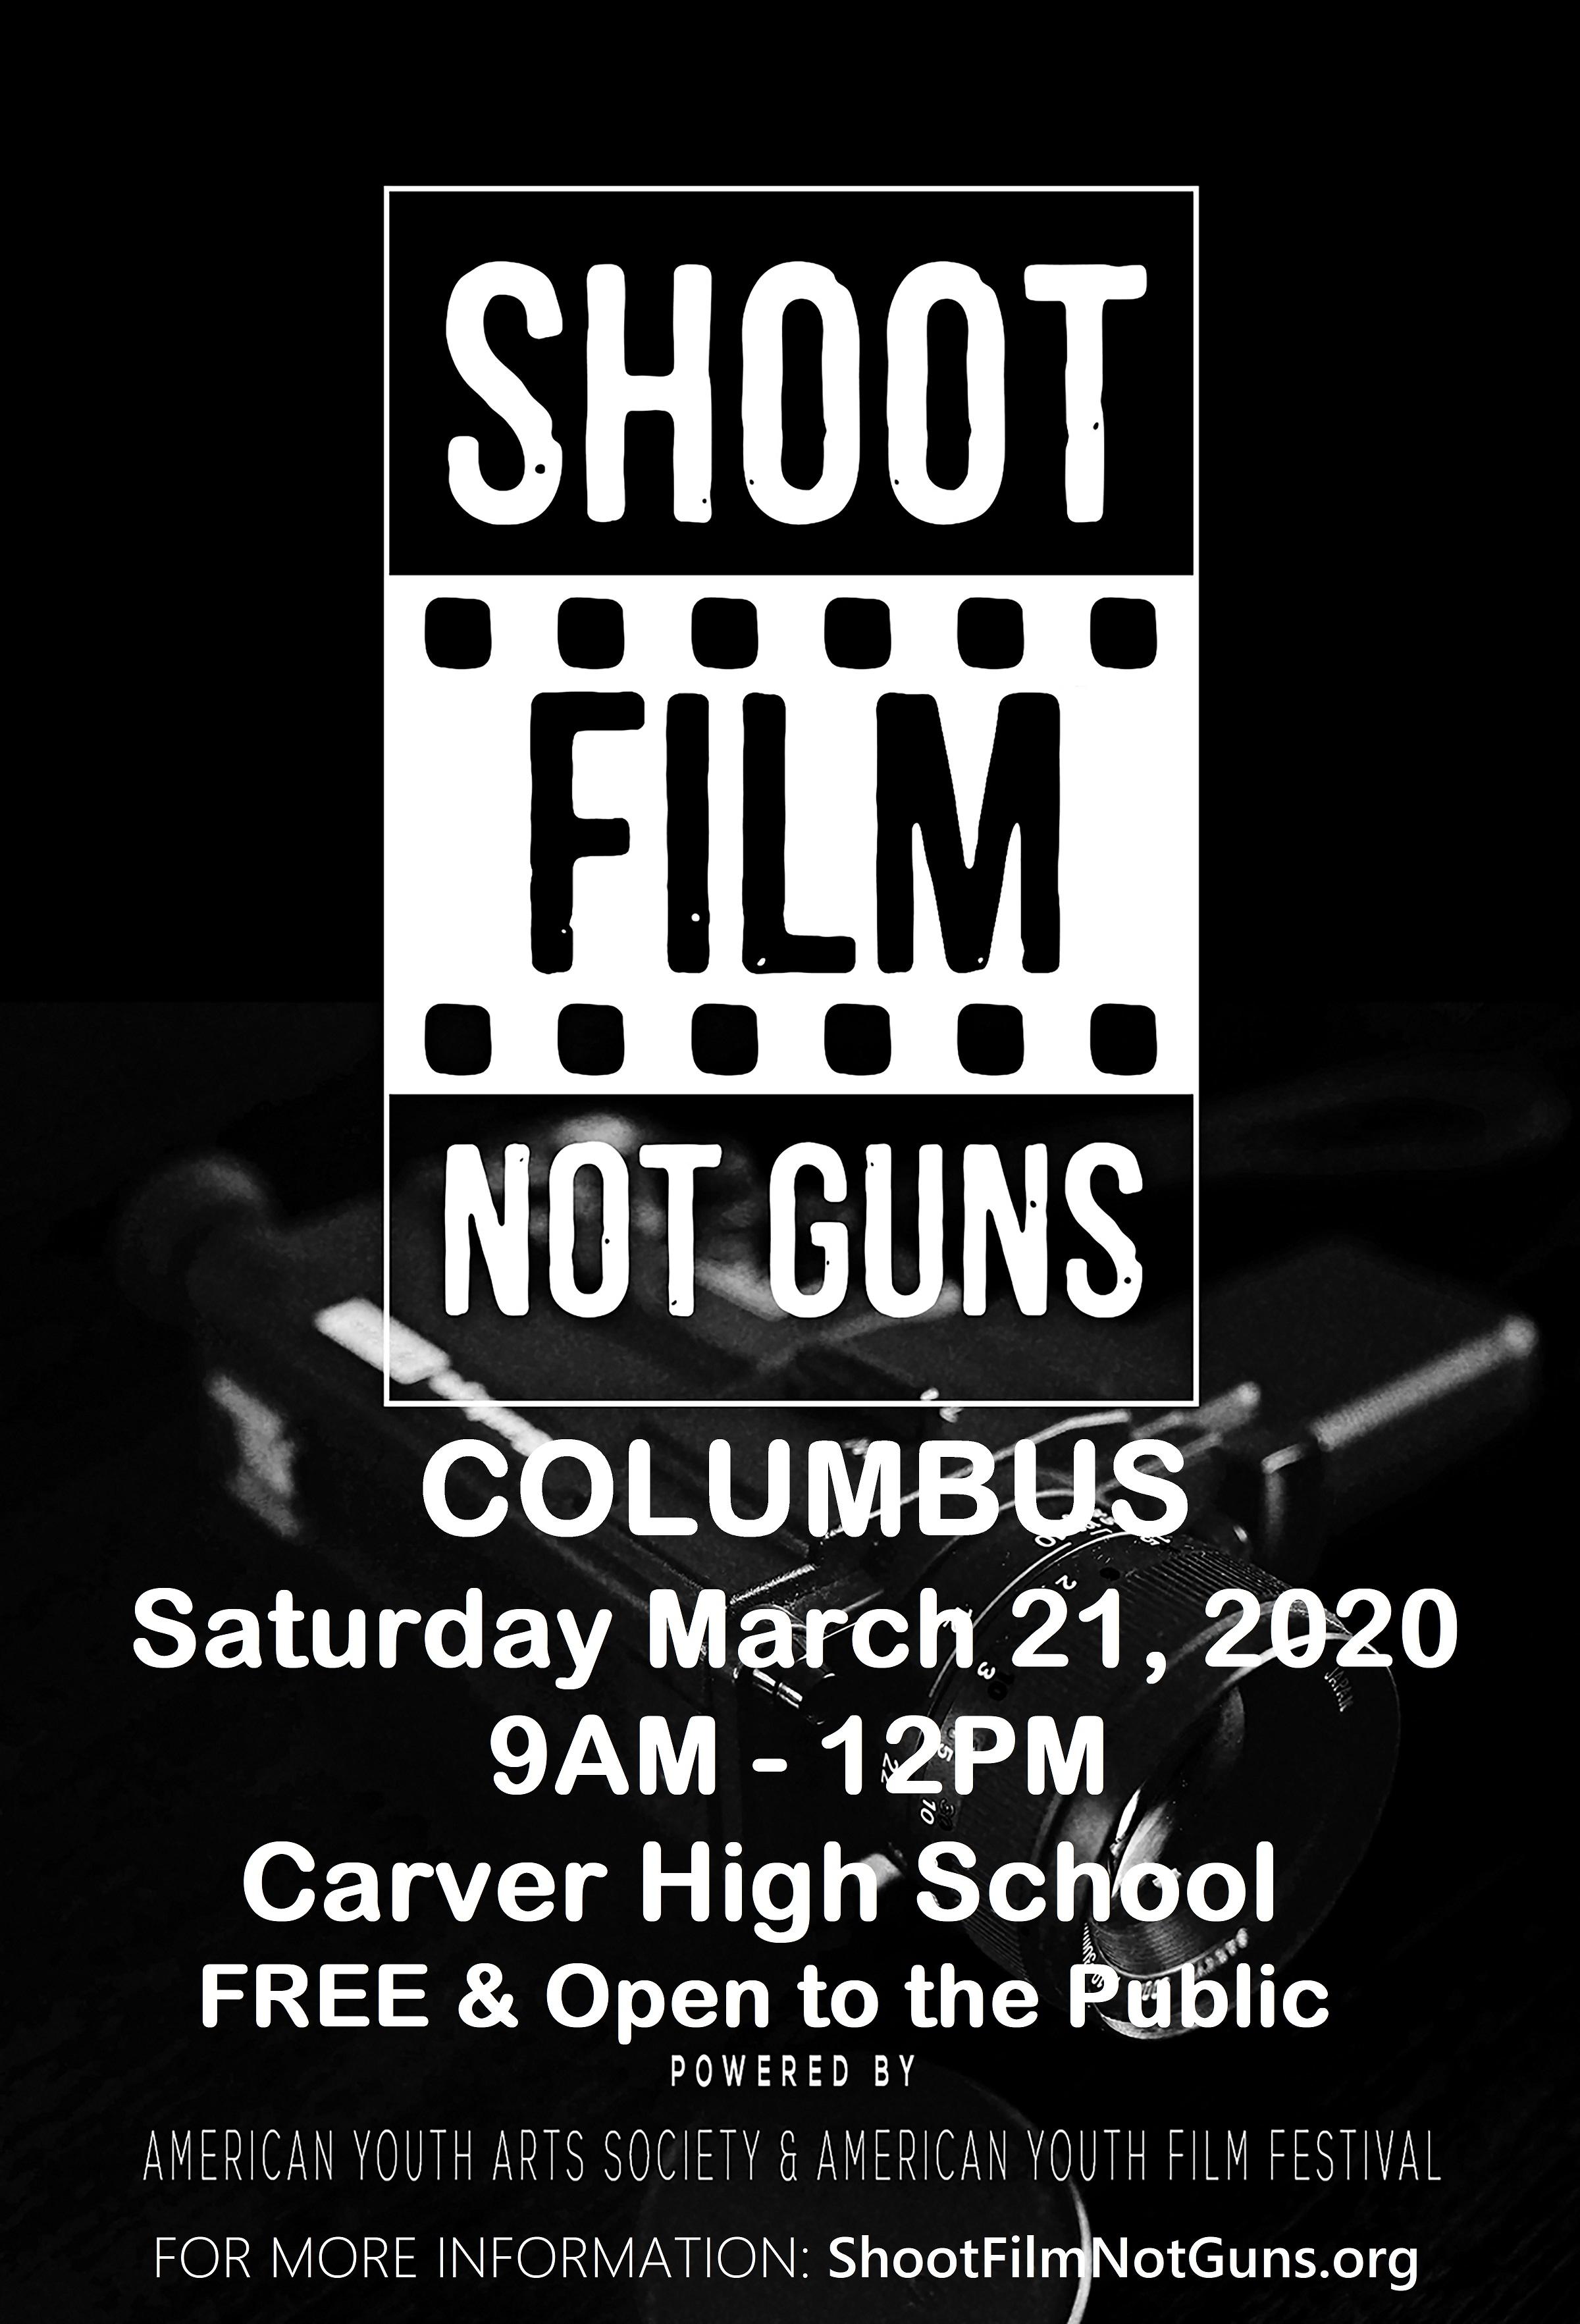 The Shoot Film Not Guns Anti-bullying/Stop the Violence Initiative